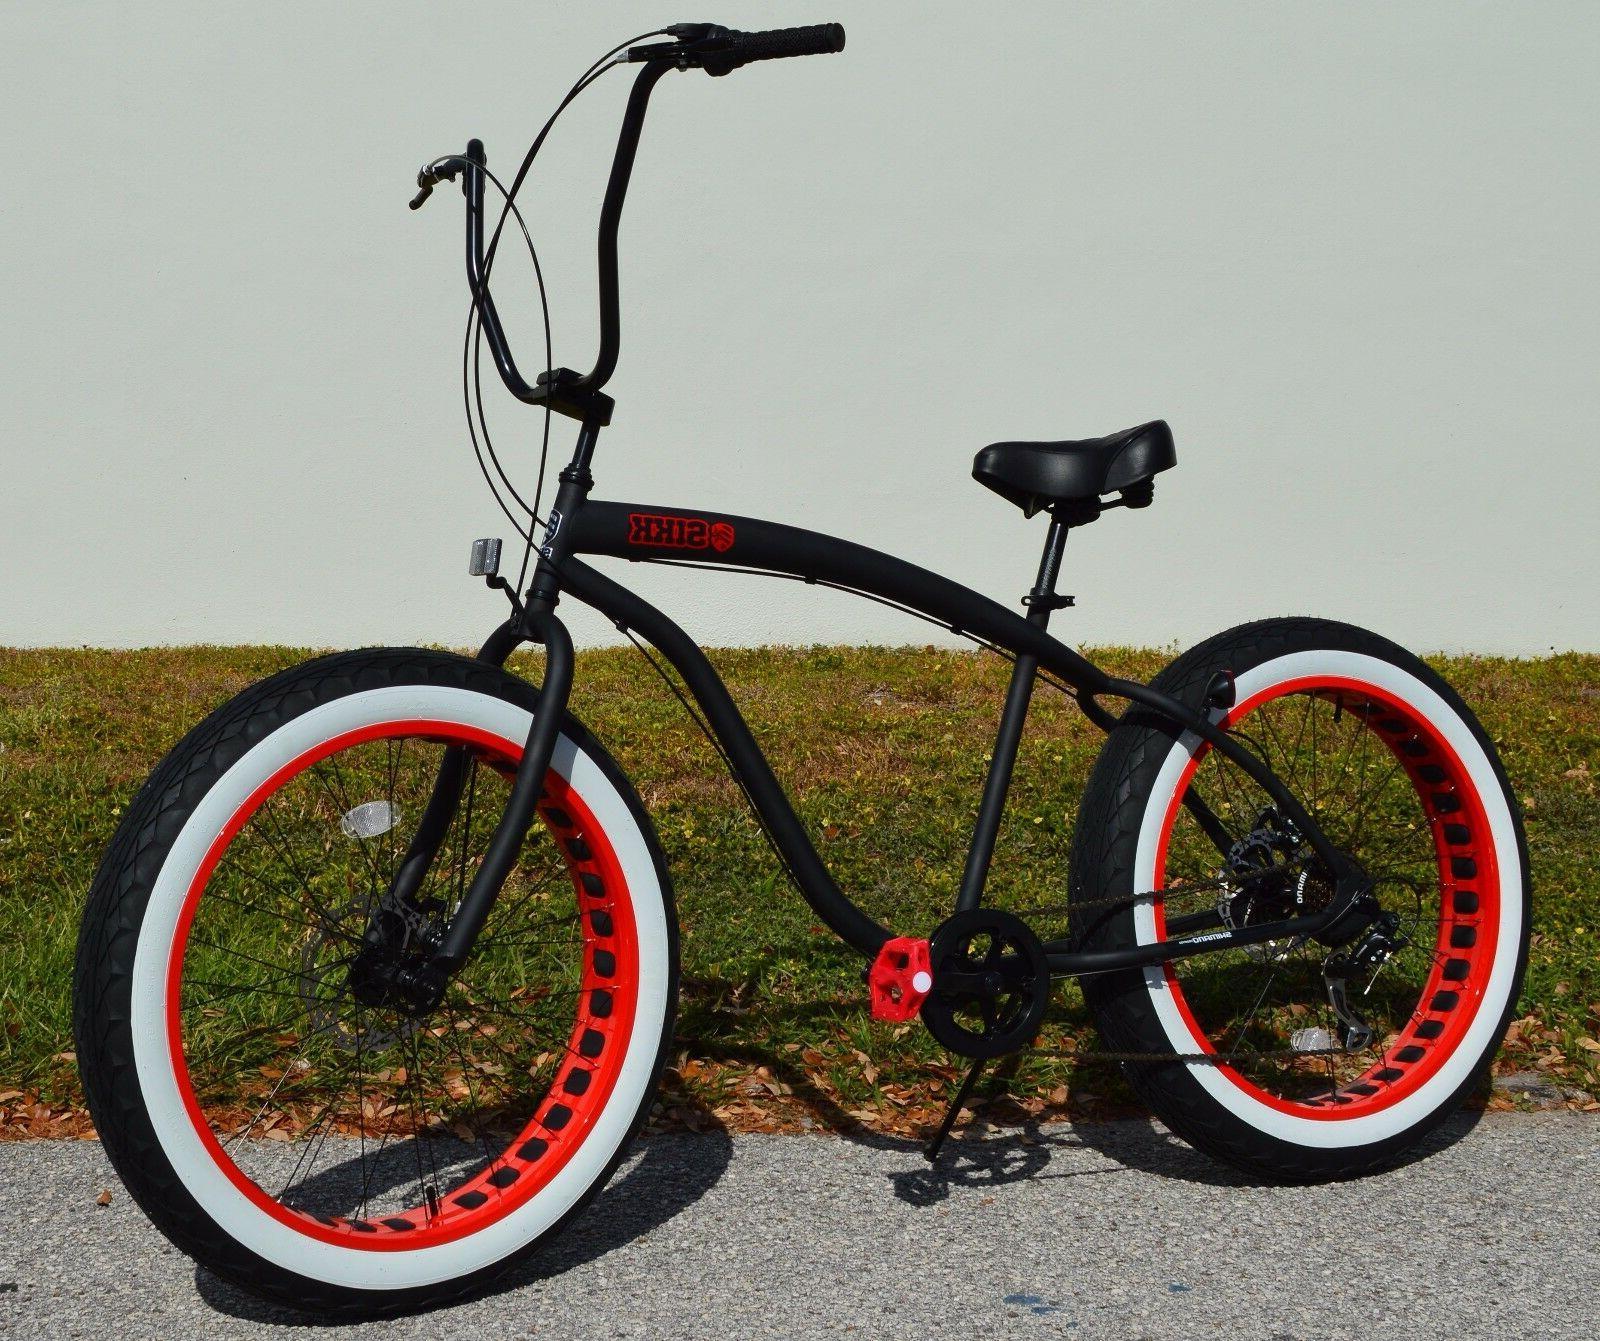 Fat Bike SIKK w Rim Tires 7